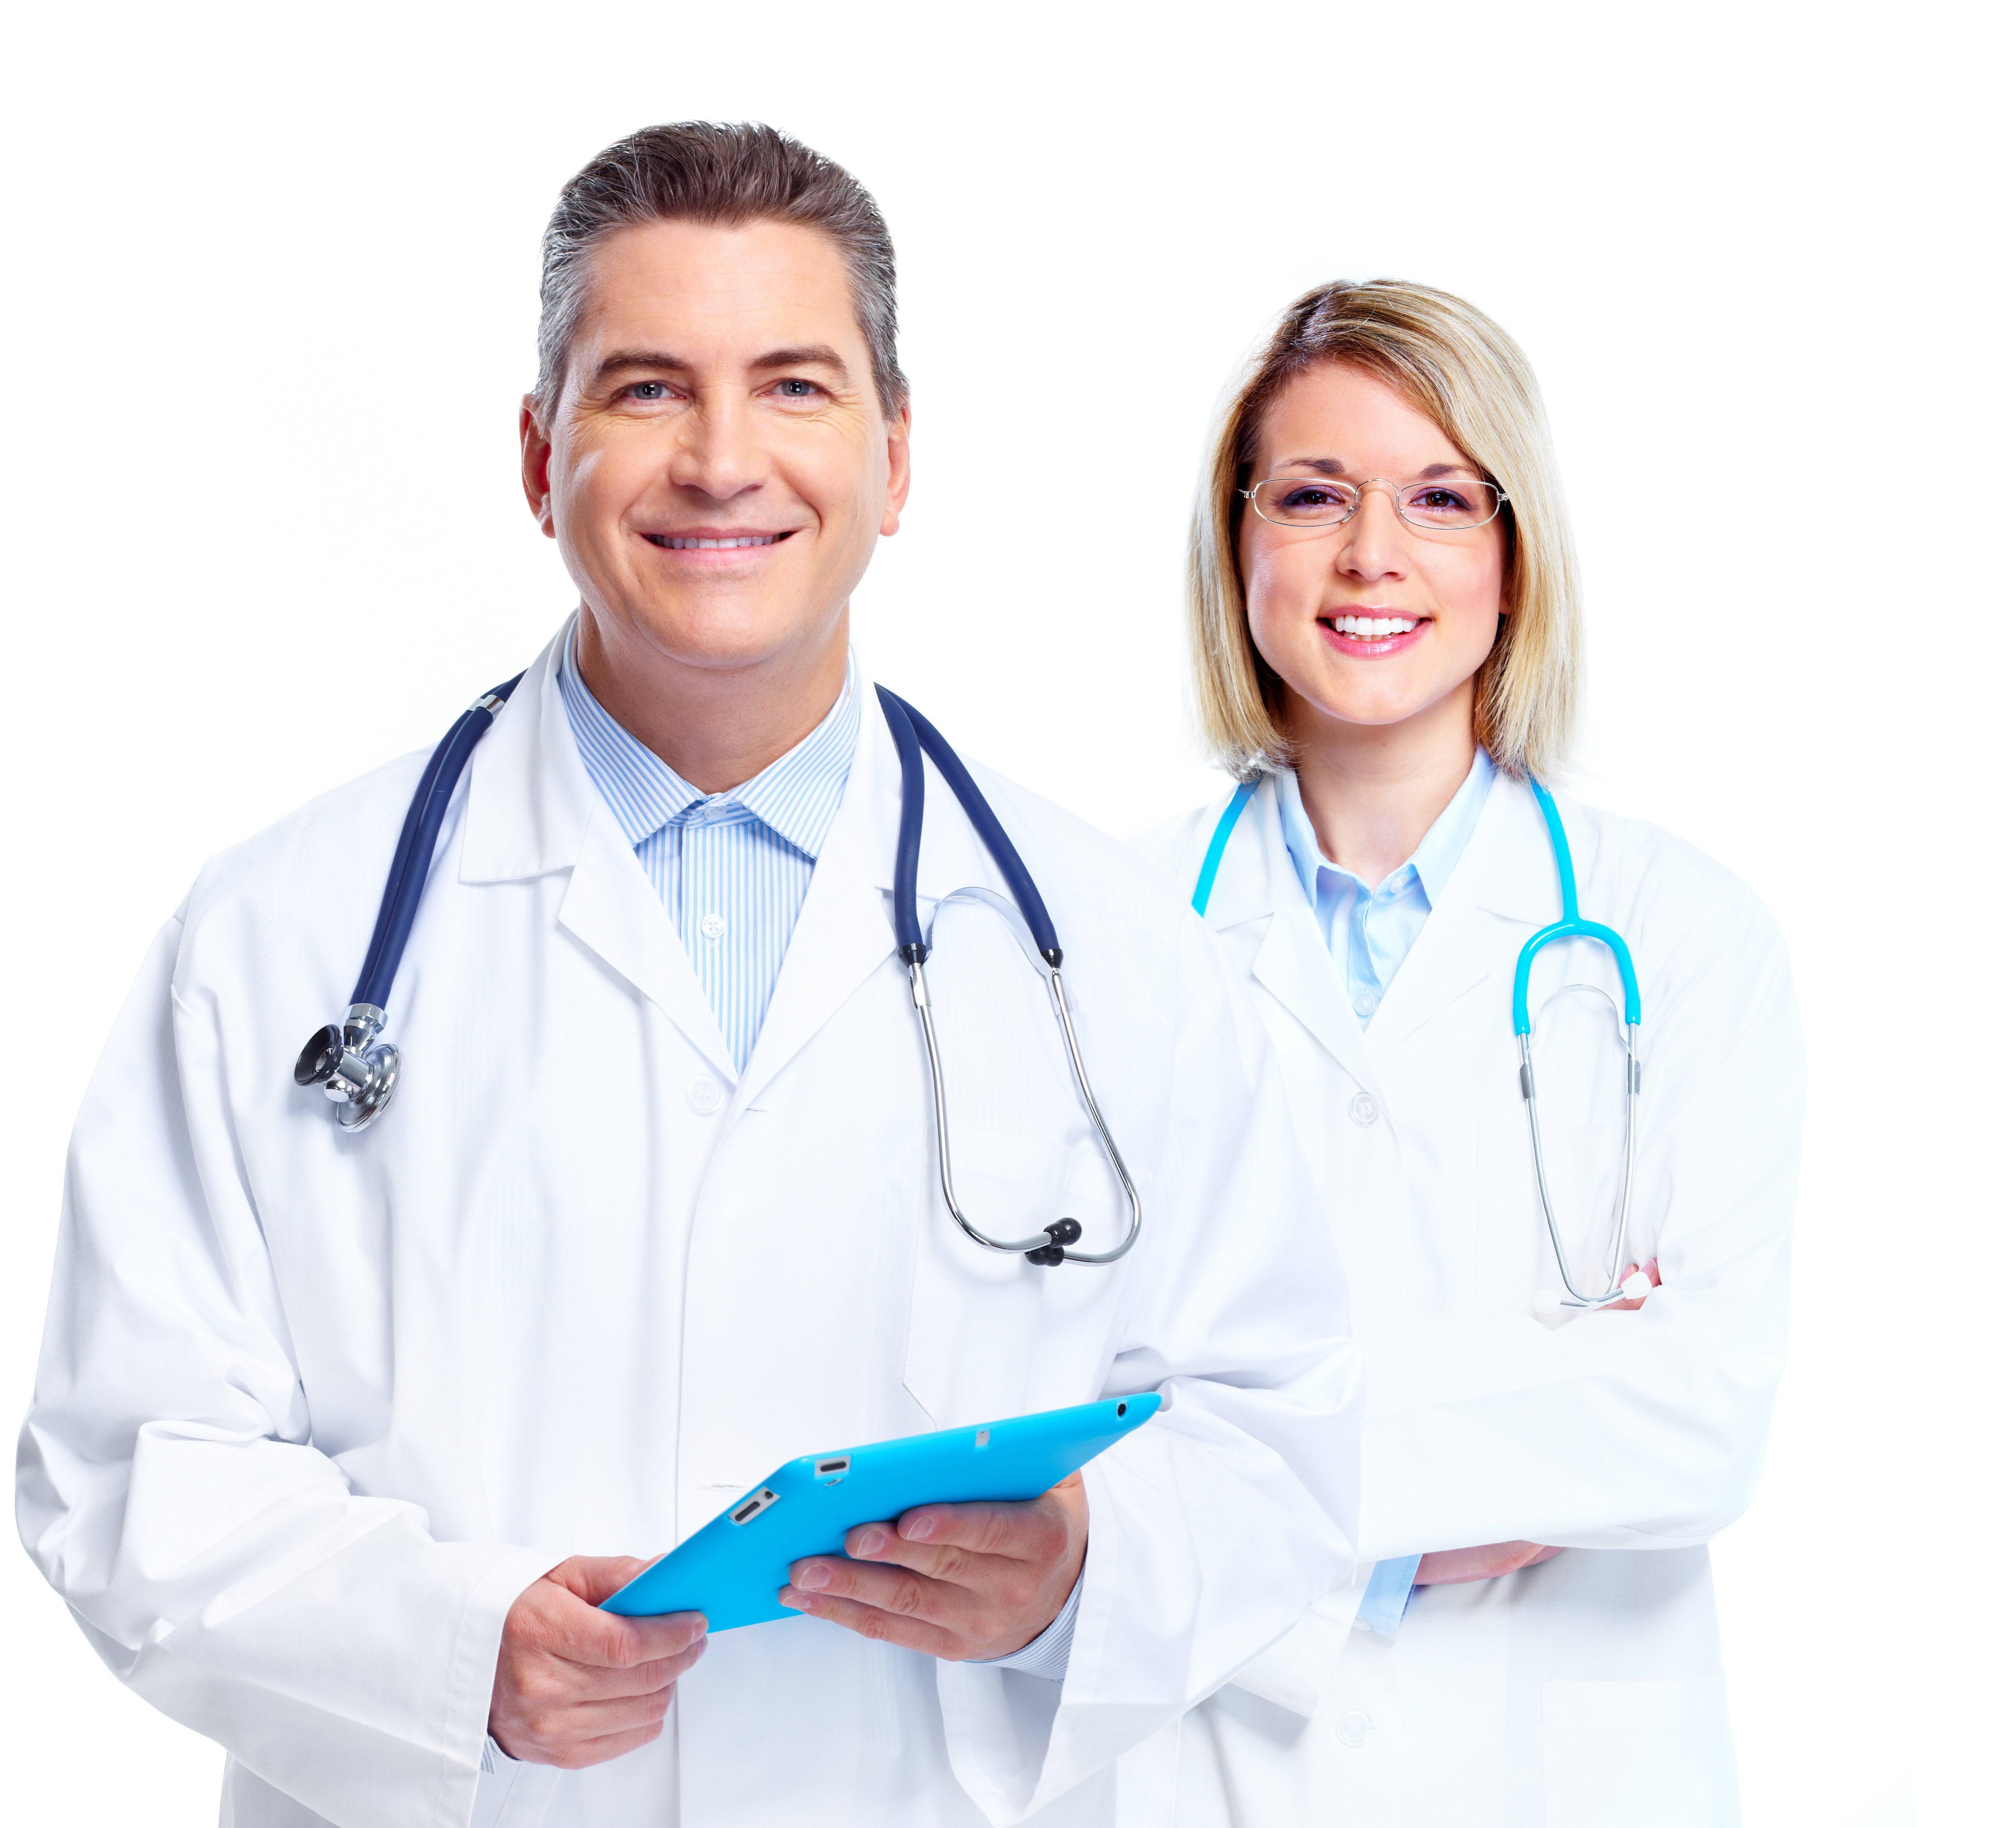 врач картинки